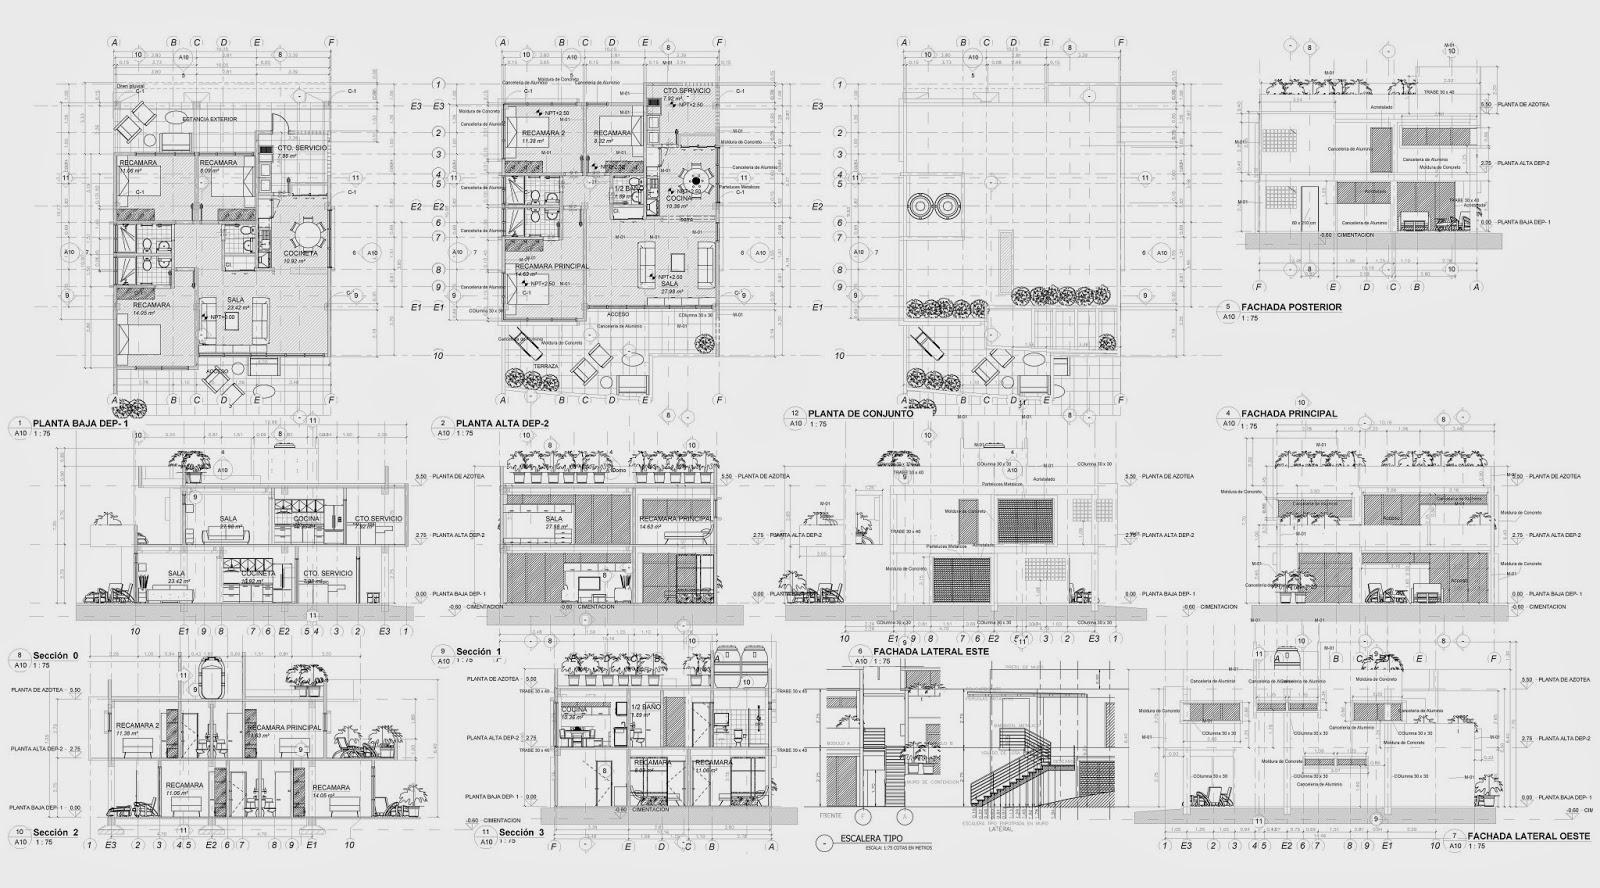 Proyecto ejecutivo cubik arquitectura carlos tapia for Planos en pdf arquitectura